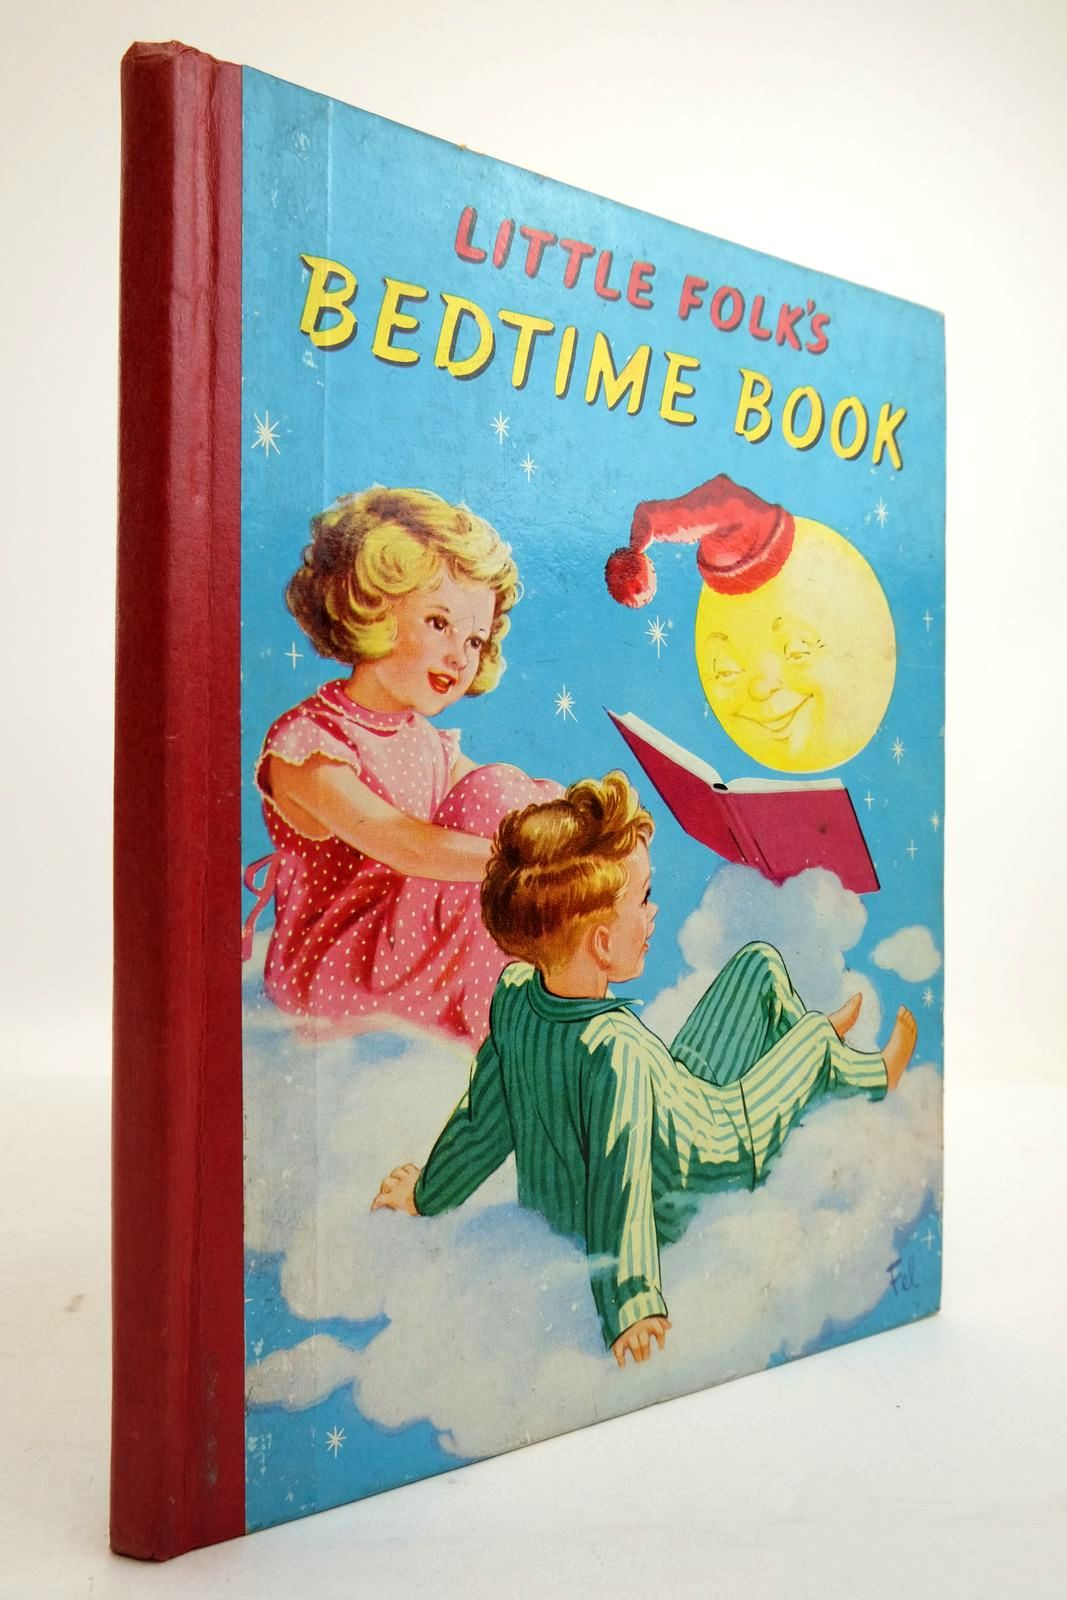 Photo of LITTLE FOLK'S BEDTIME BOOK- Stock Number: 2134470